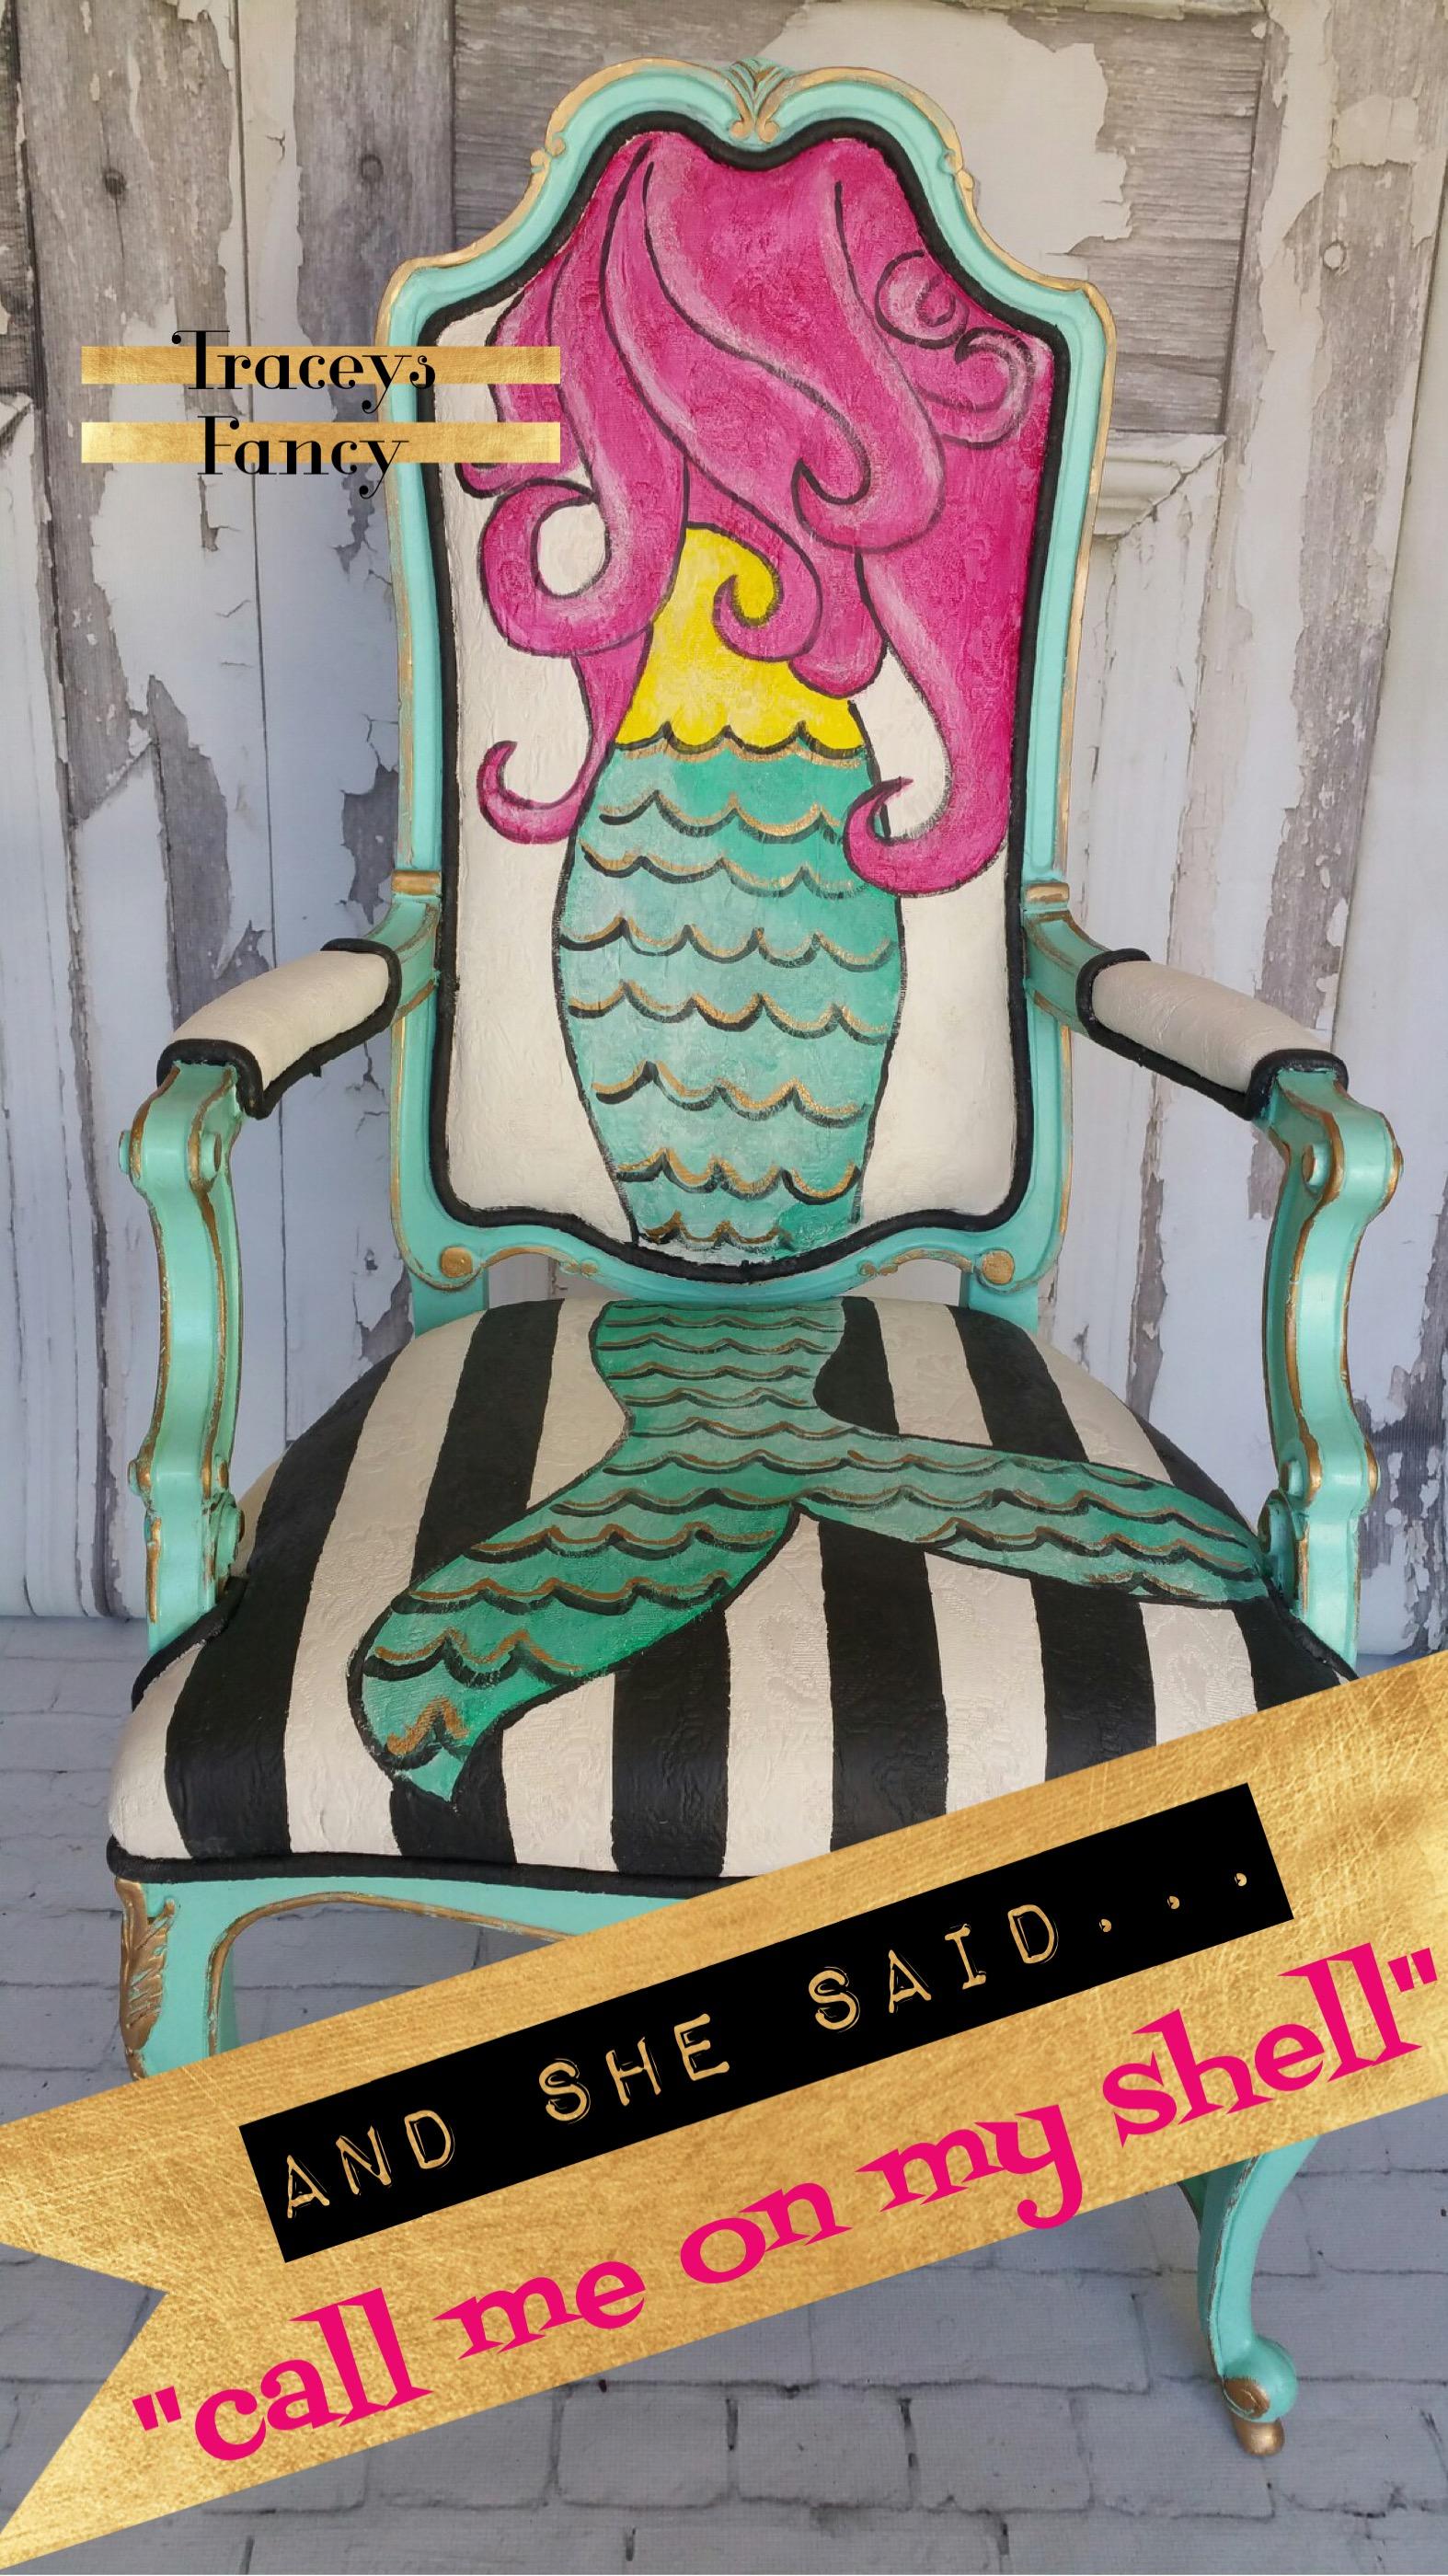 Mermaid Chair | Tracey's Fancy